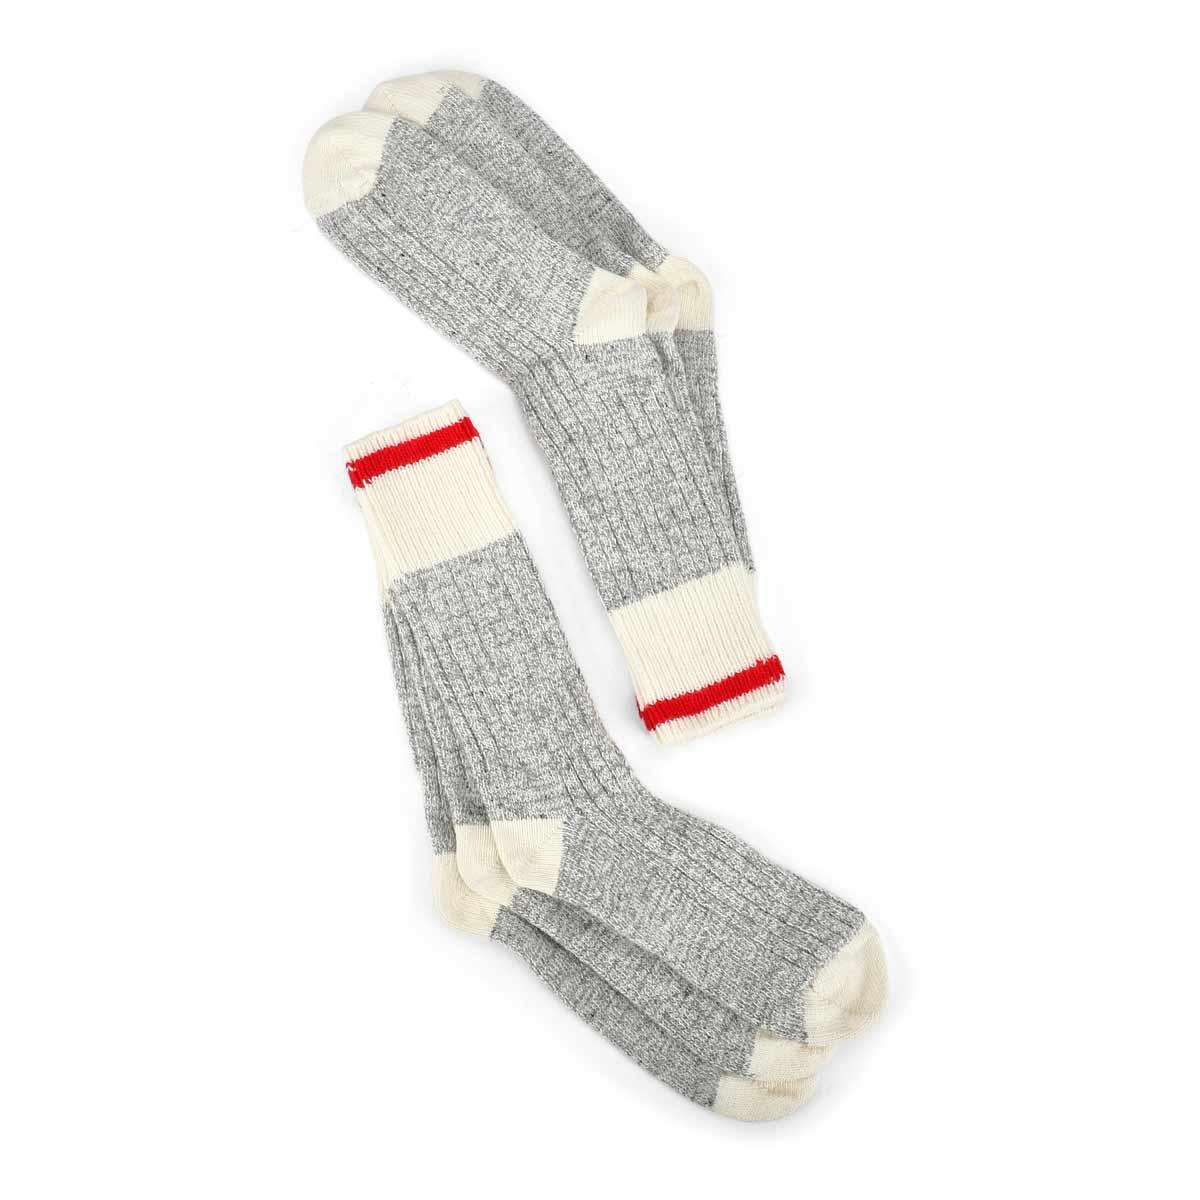 Men's DURAY grey/white wool blend sock - 3pk